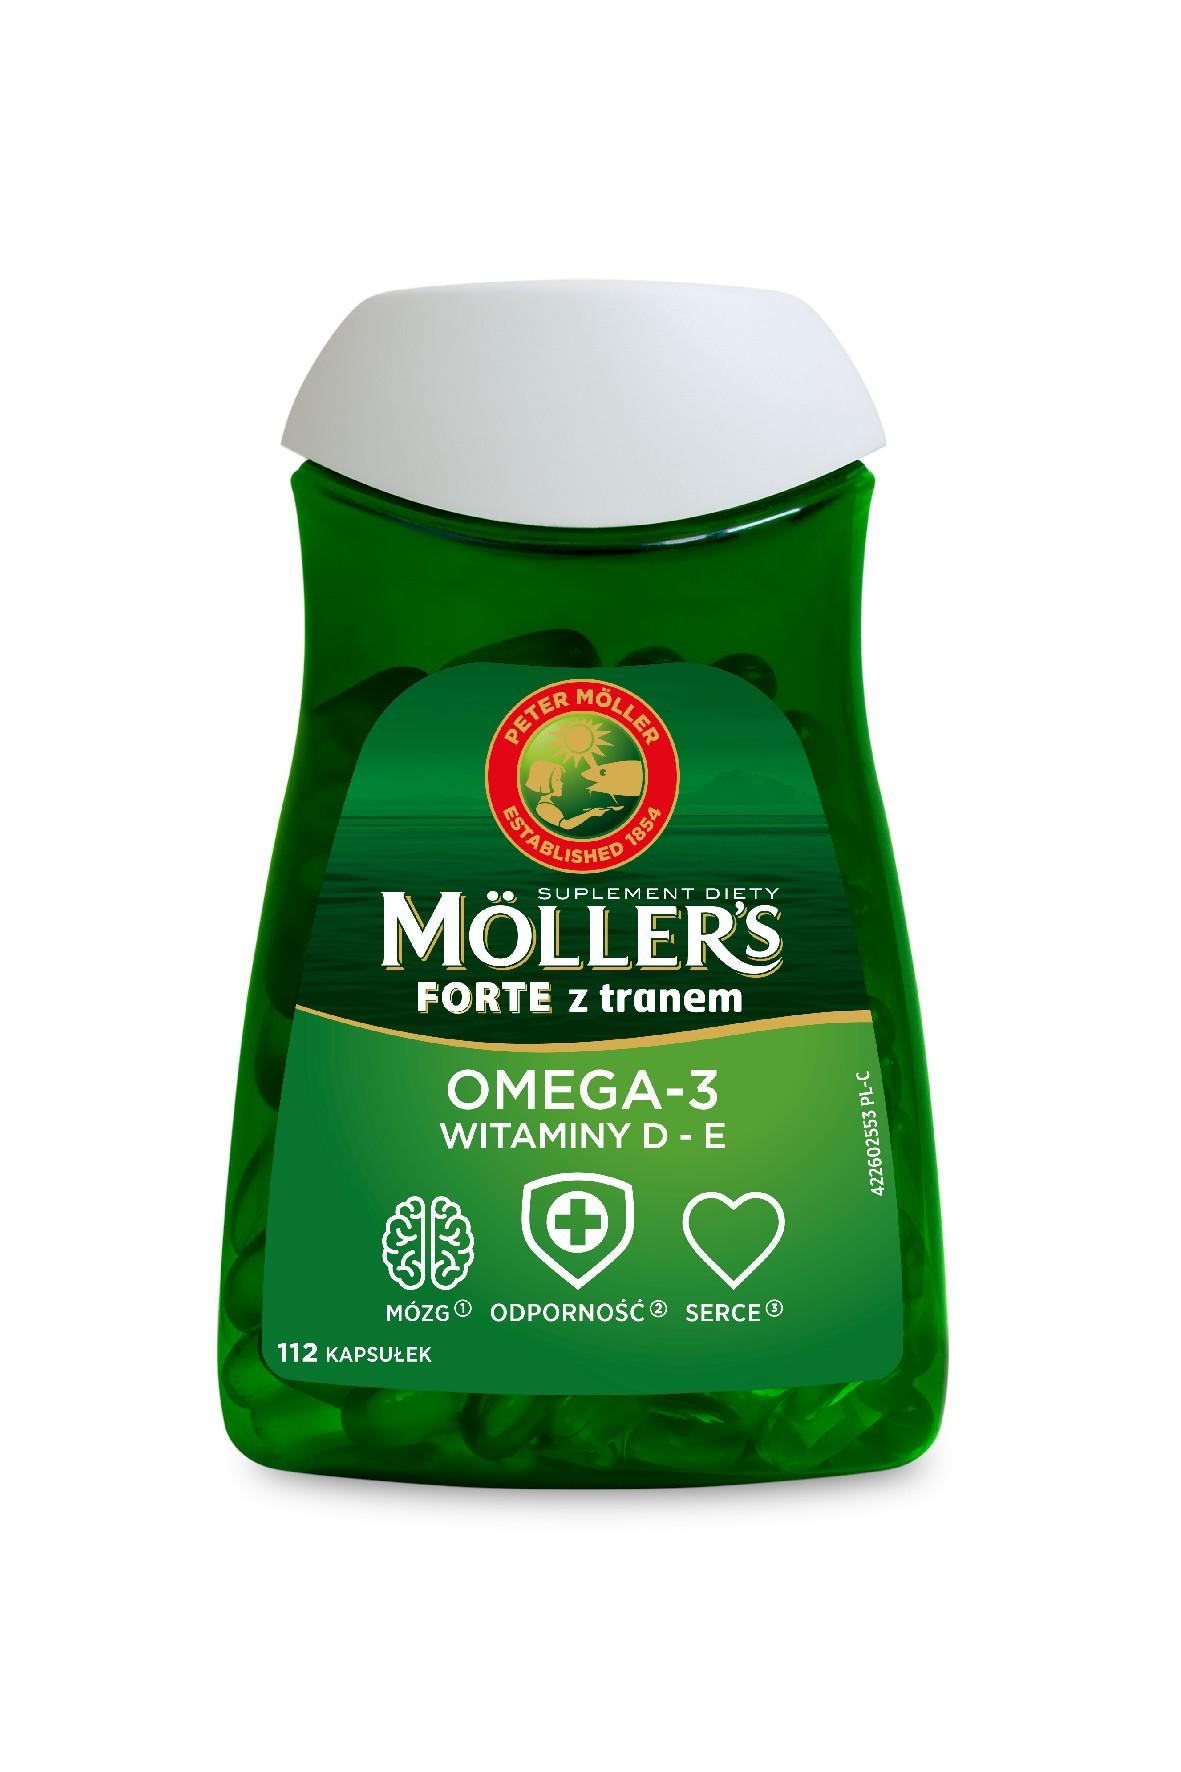 Möller's Forte z tranem 112 kapsułek